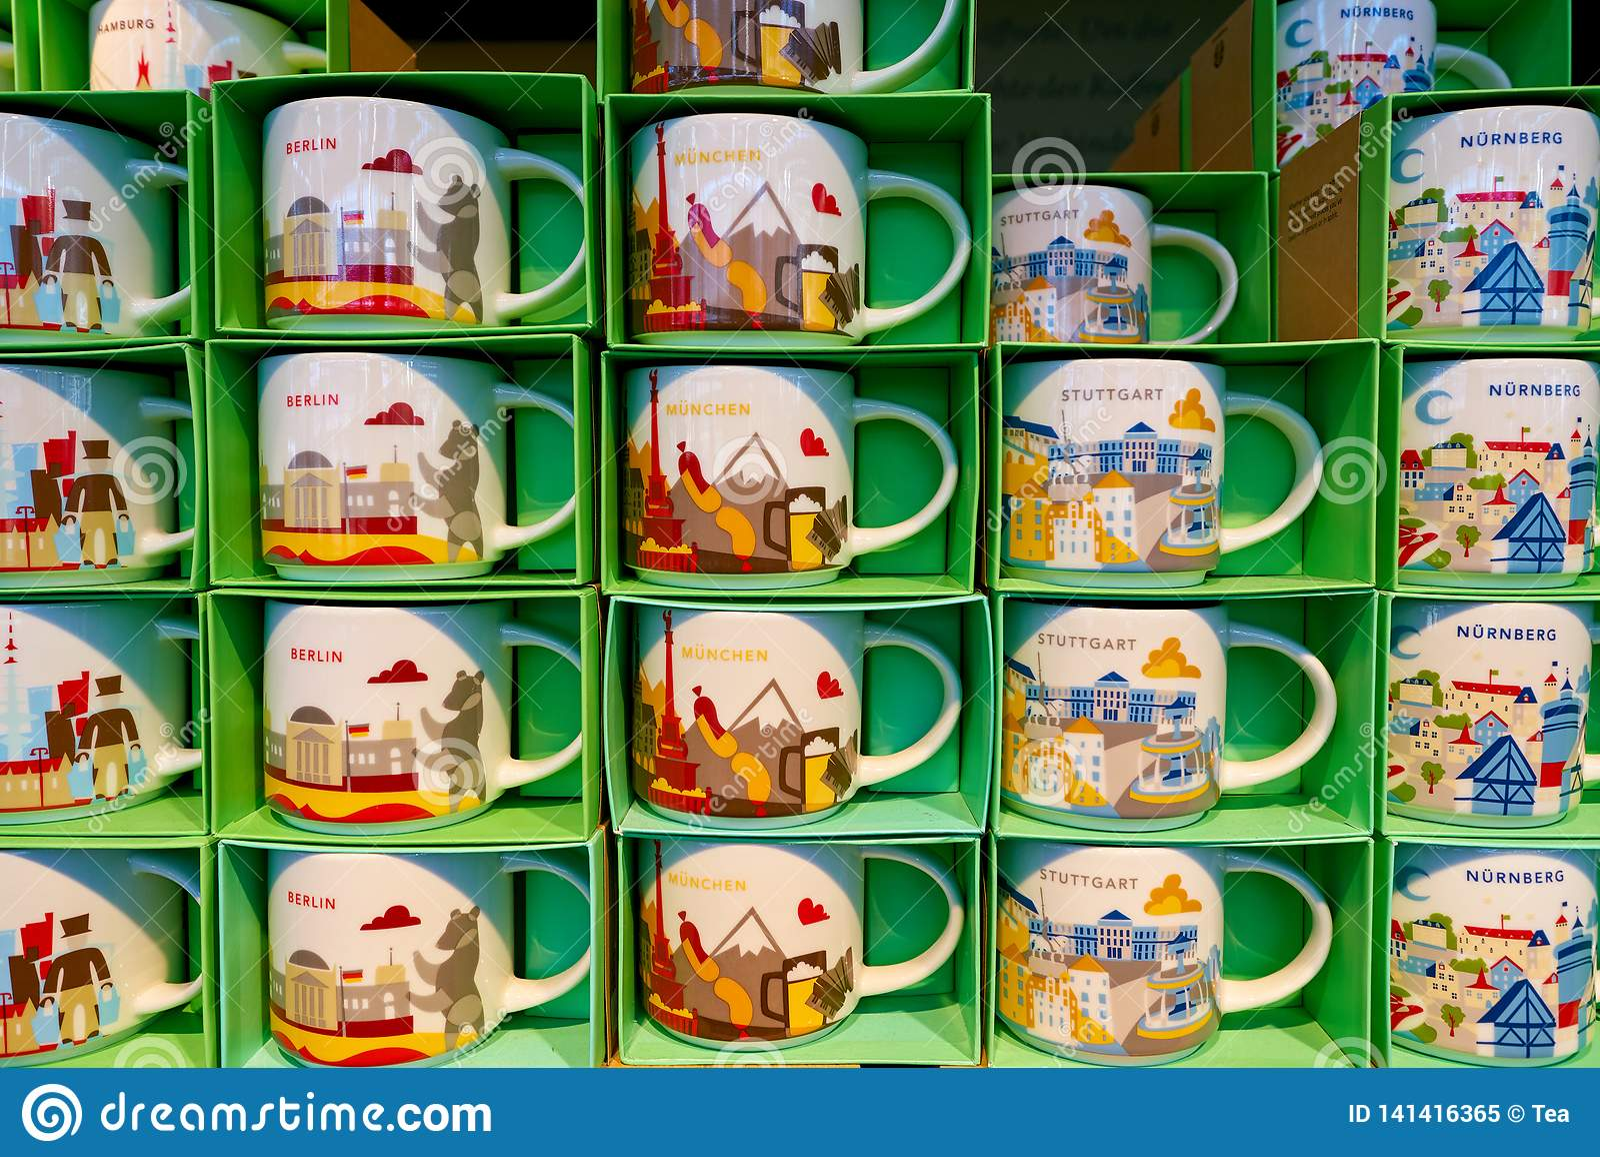 Starbucks Editorial Image Image Of Nurnberg Coffeehouse 141416365